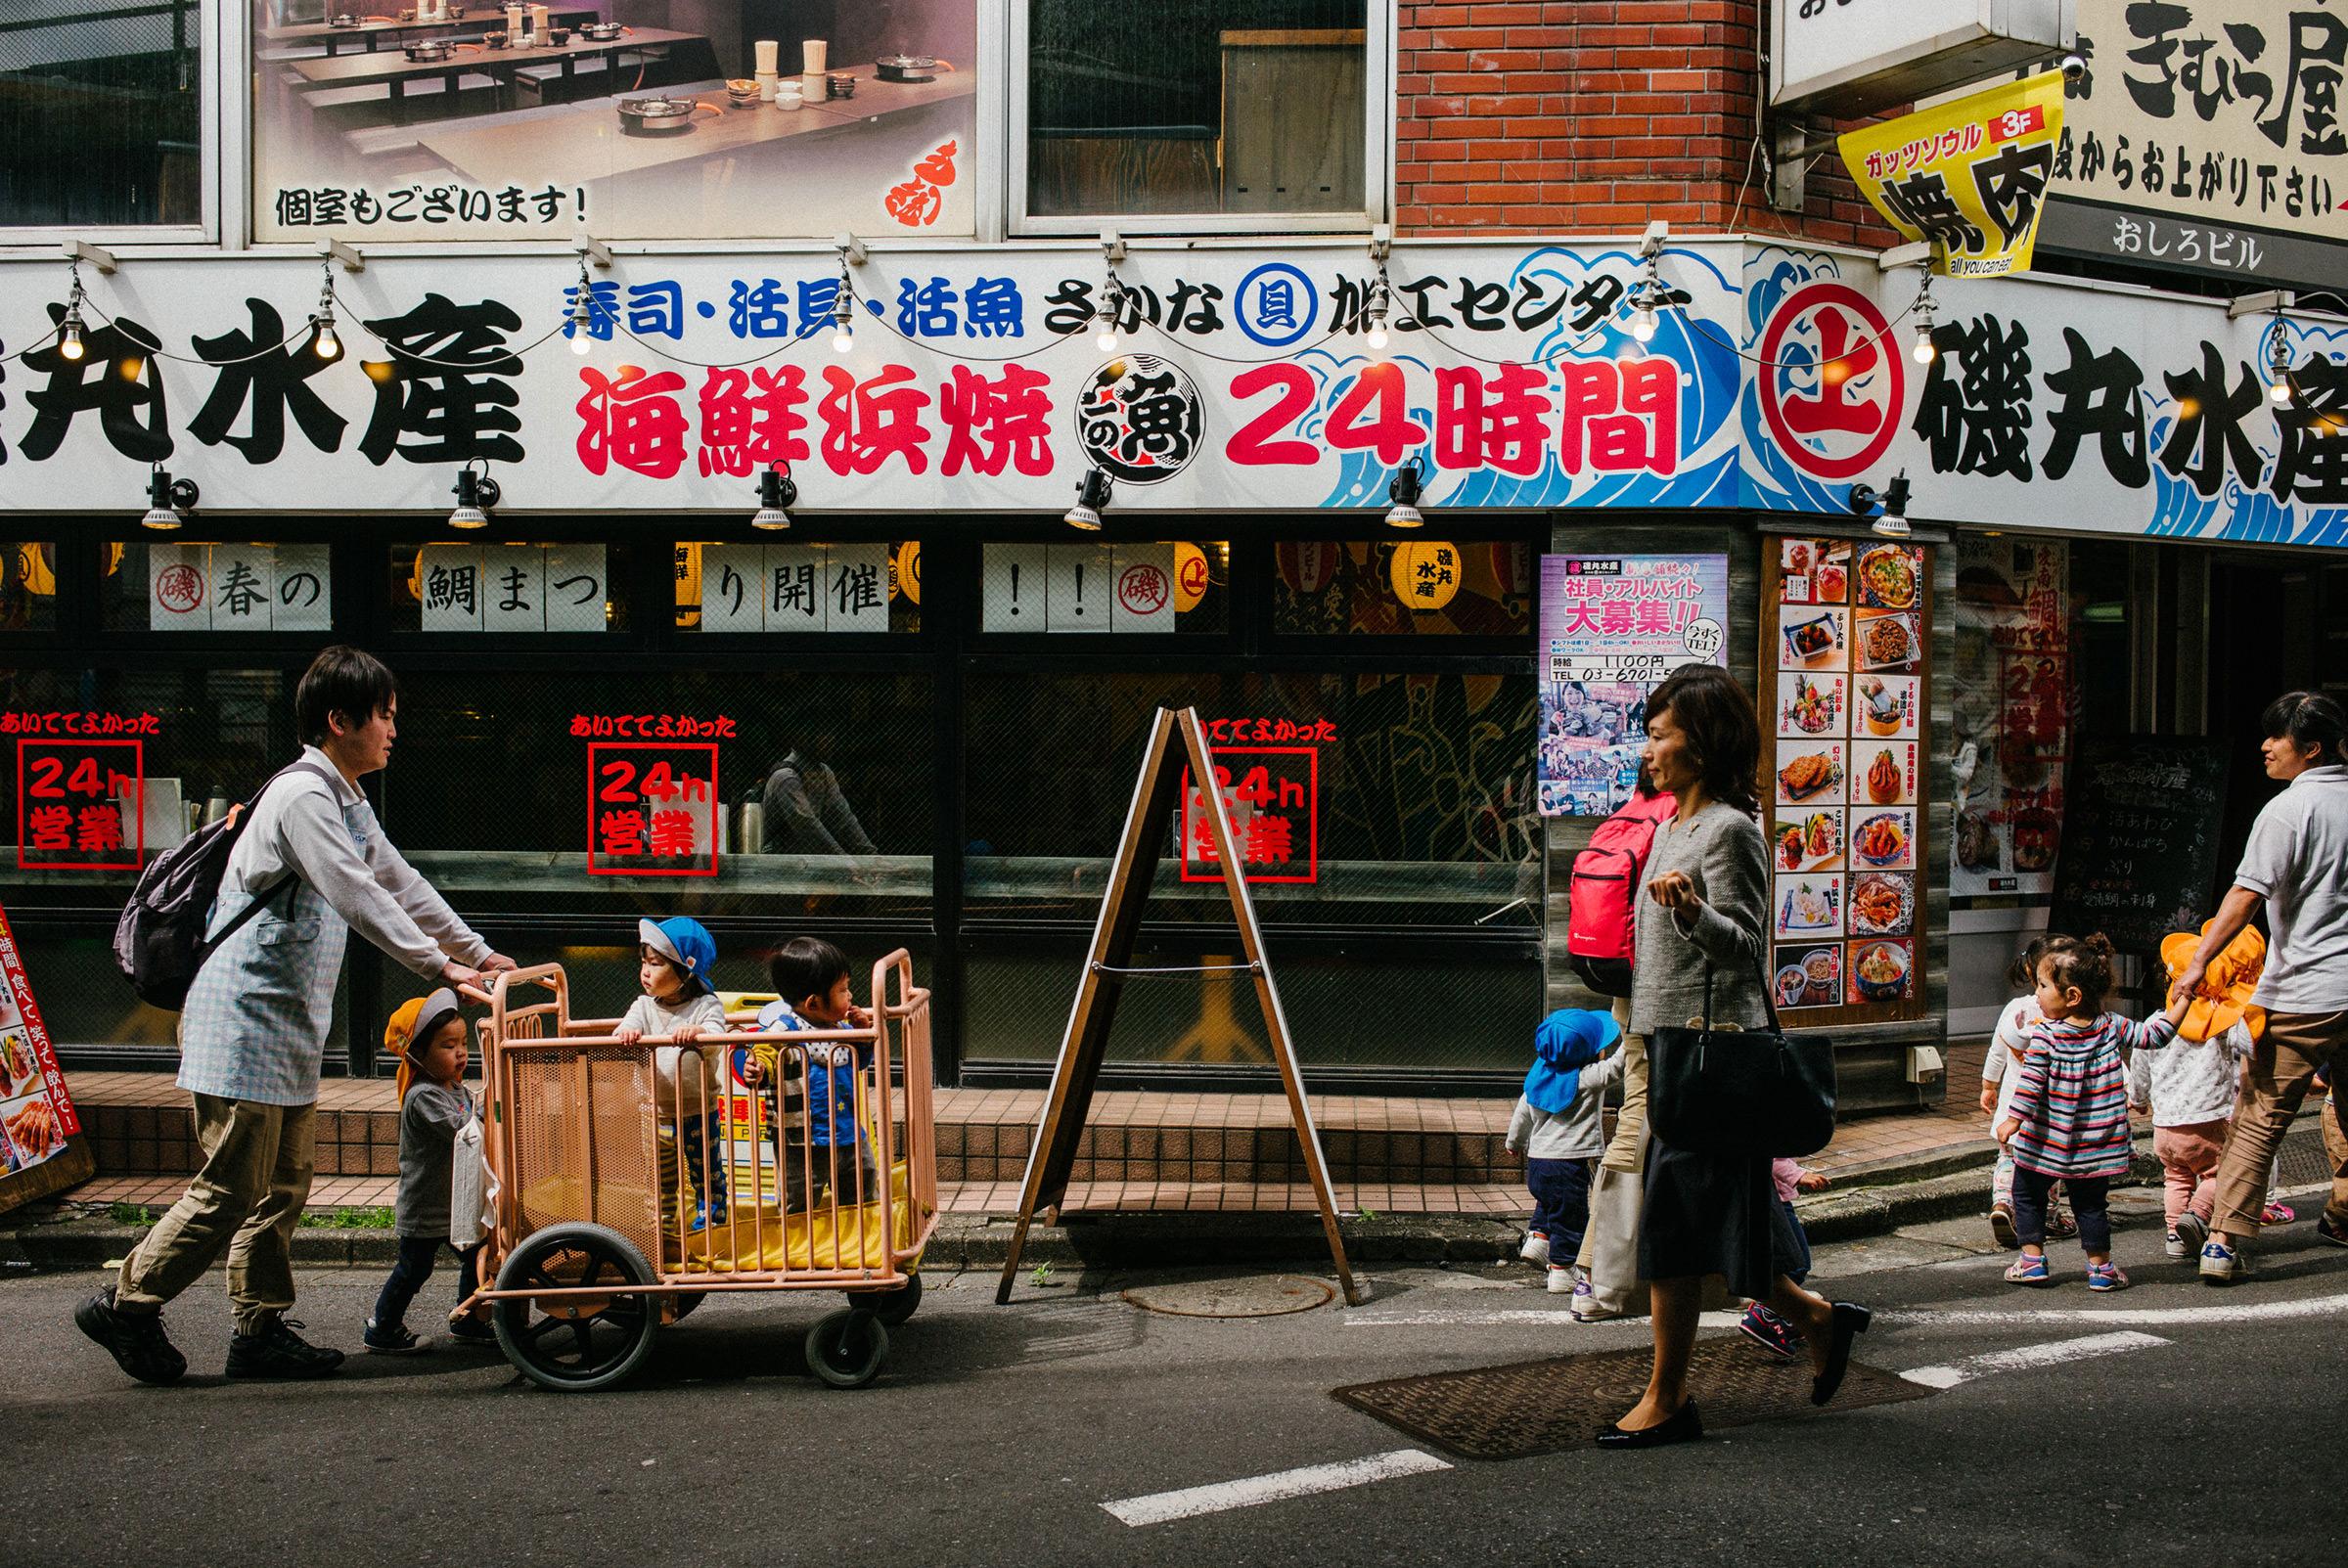 brandon_patoc_travel_japan_worldwide_photographer0003.jpg